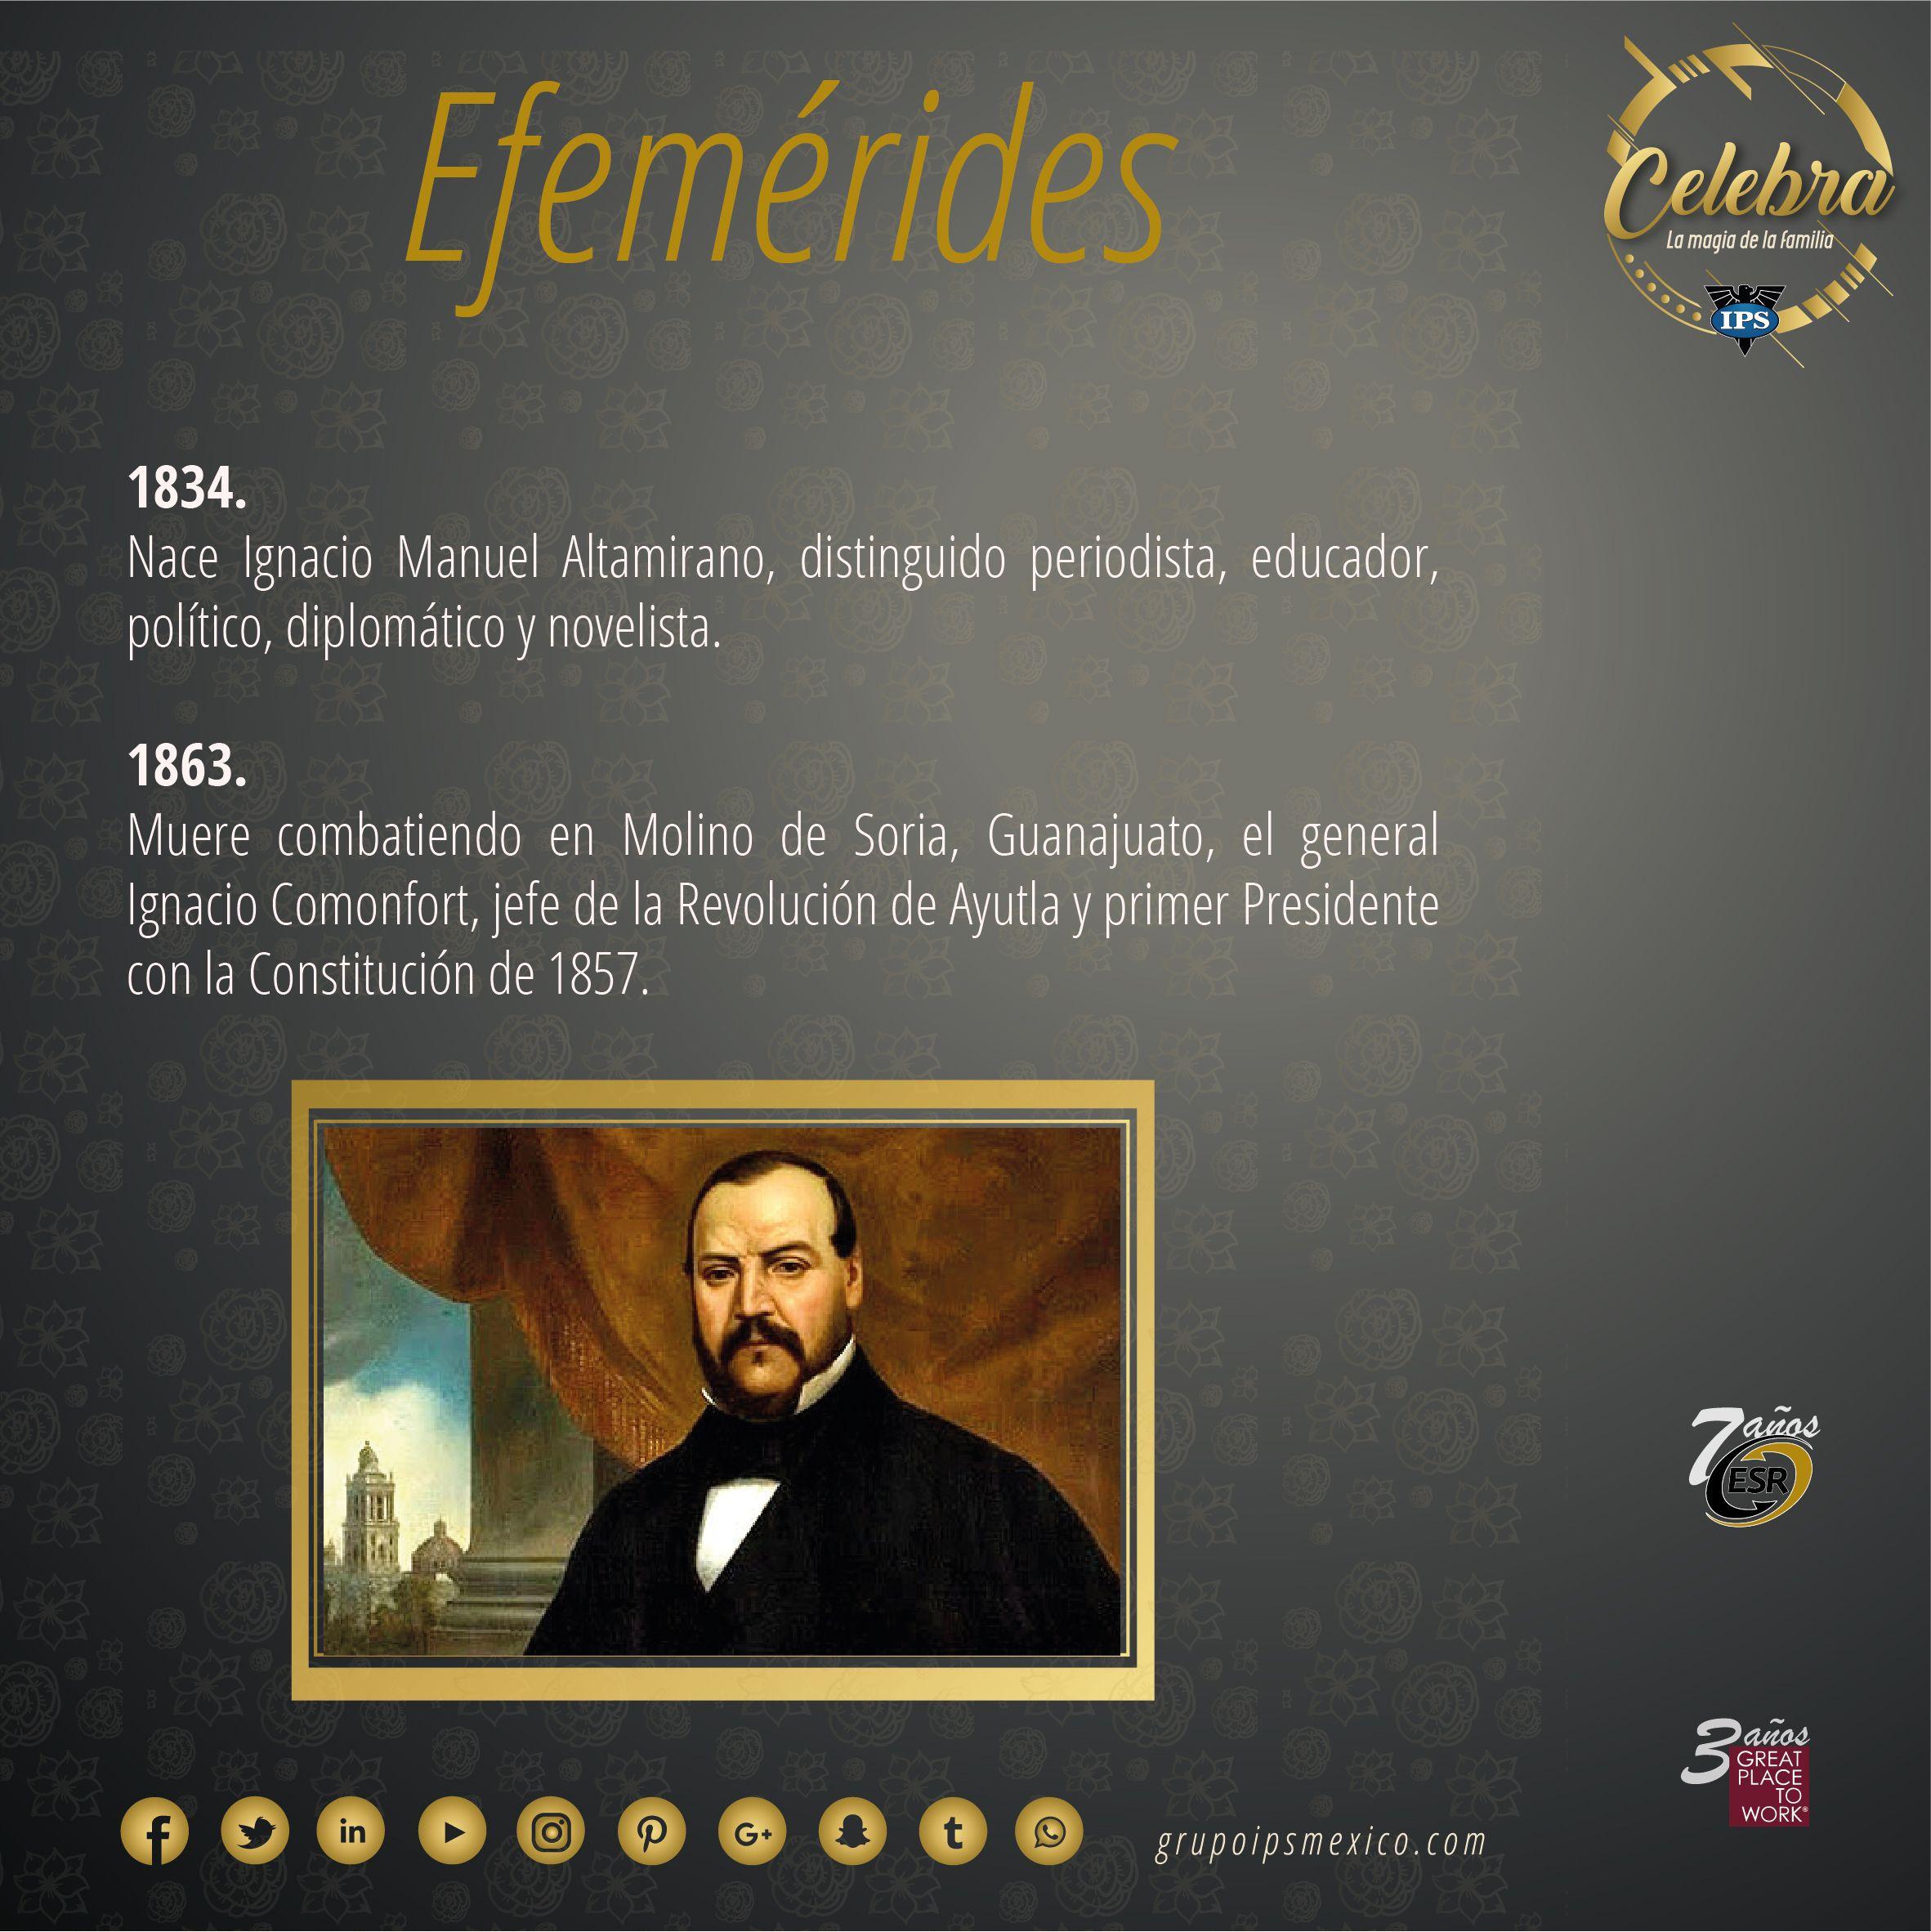 Pin en Efemérides